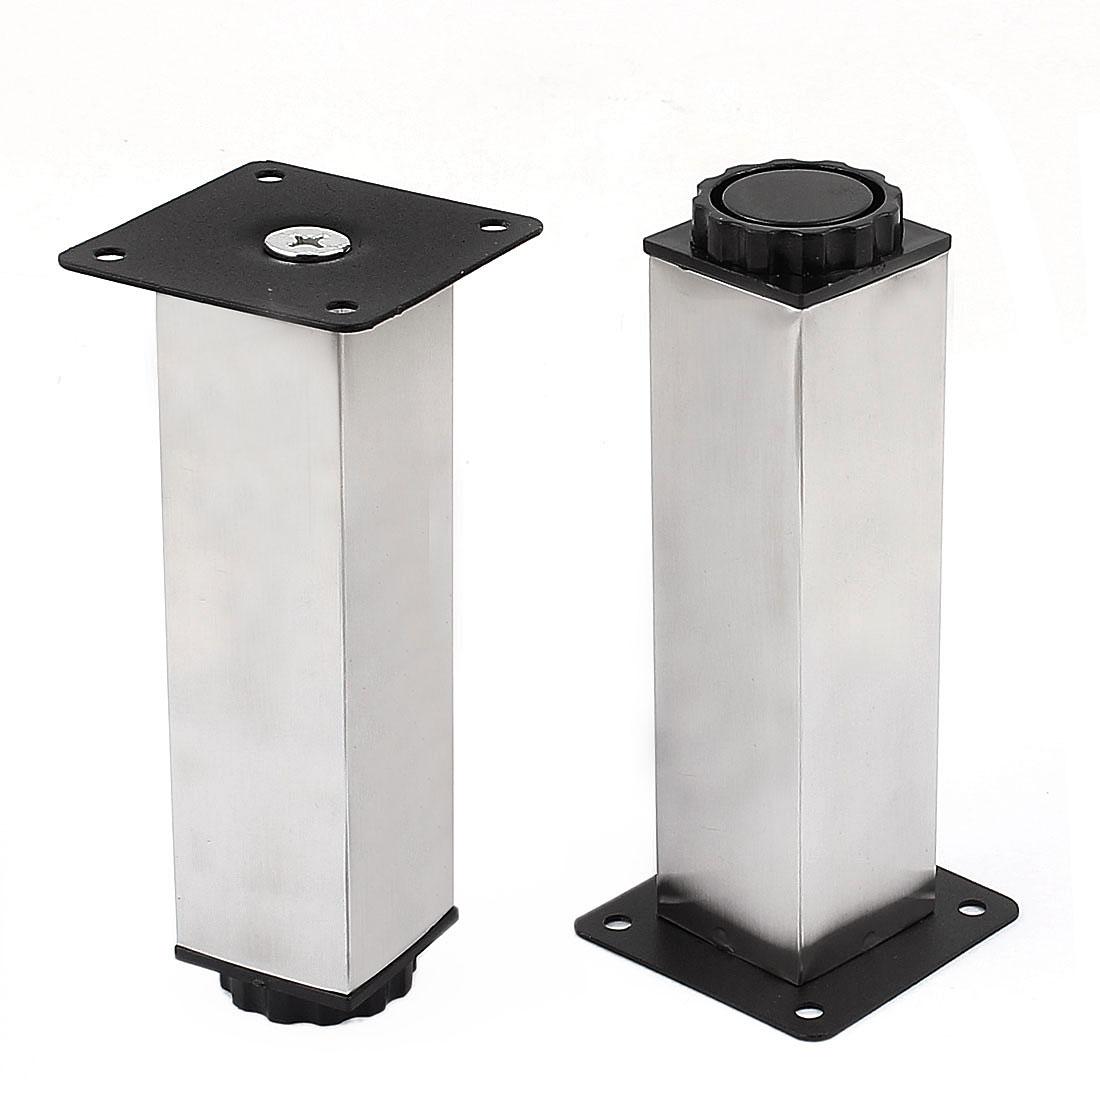 Kitchen Furniture 38mmx150mm Adjustable Cabinet Leg Plinth Feet 2pcs